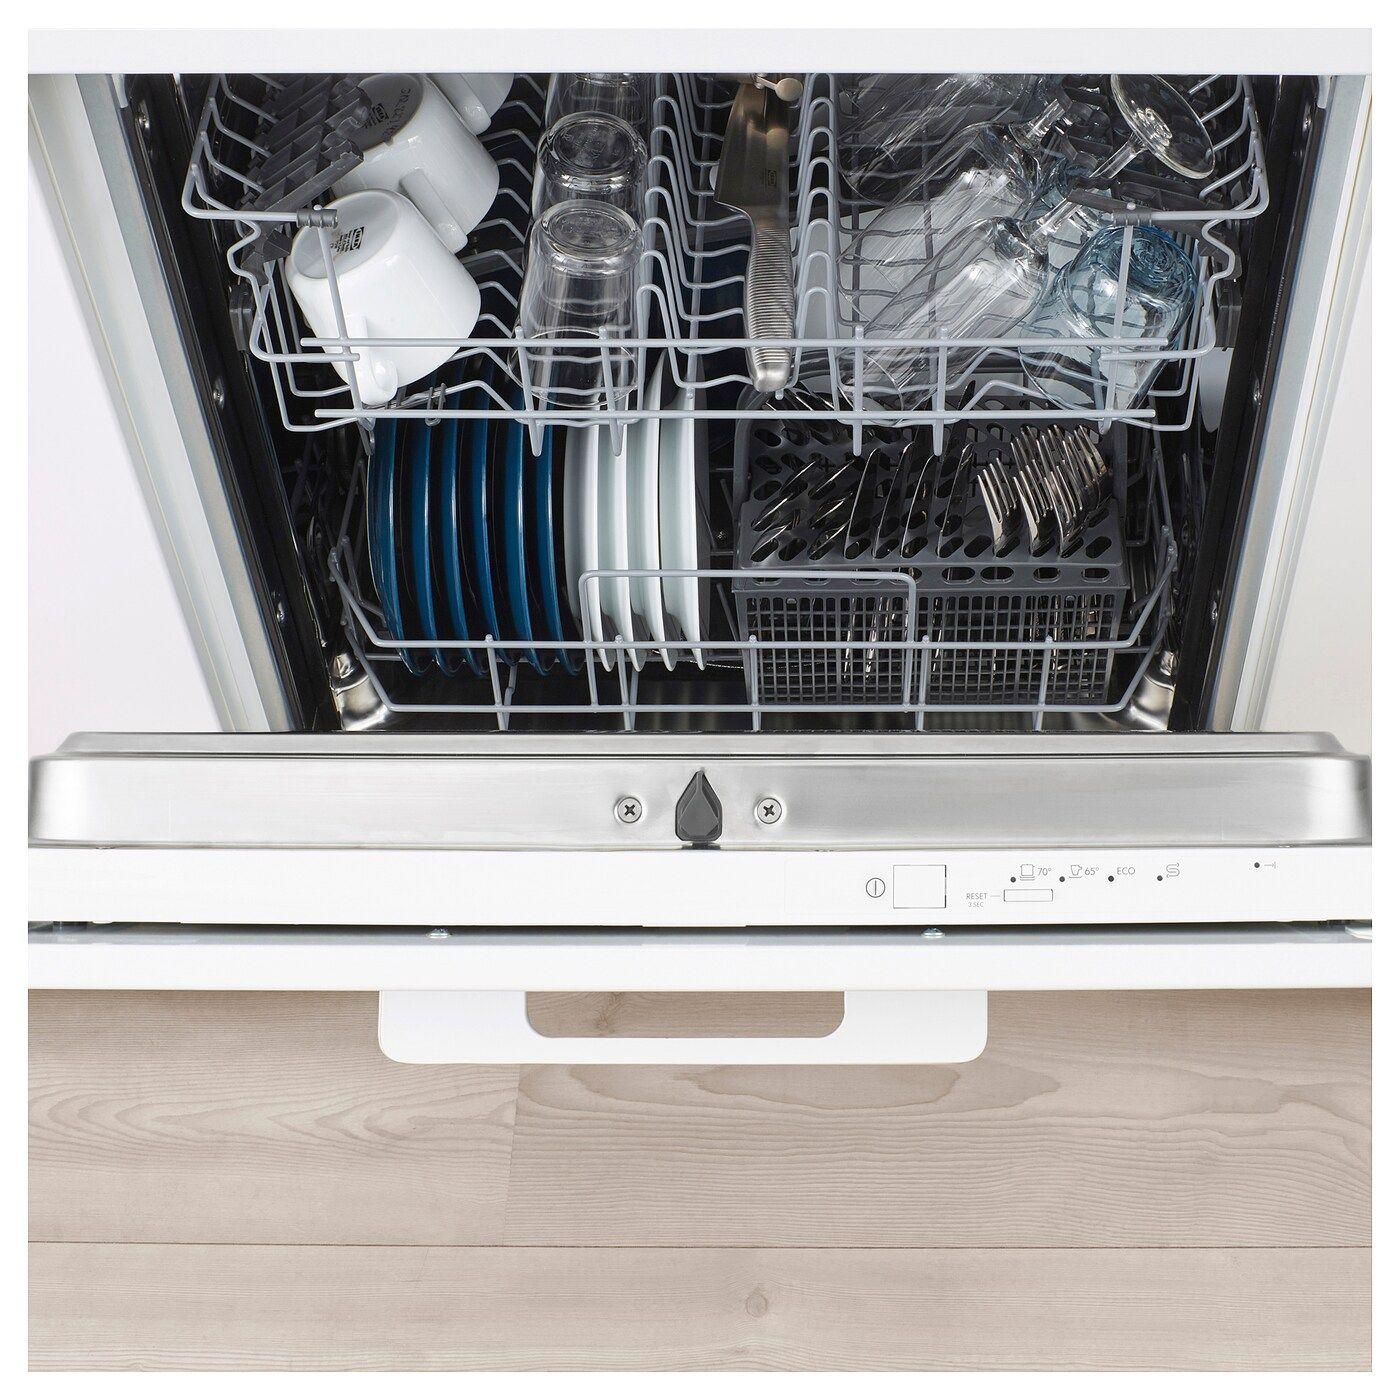 Lagan Geschirrspuler Integr Weiss Spulmaschine Geschirrspuler Und Geschirr